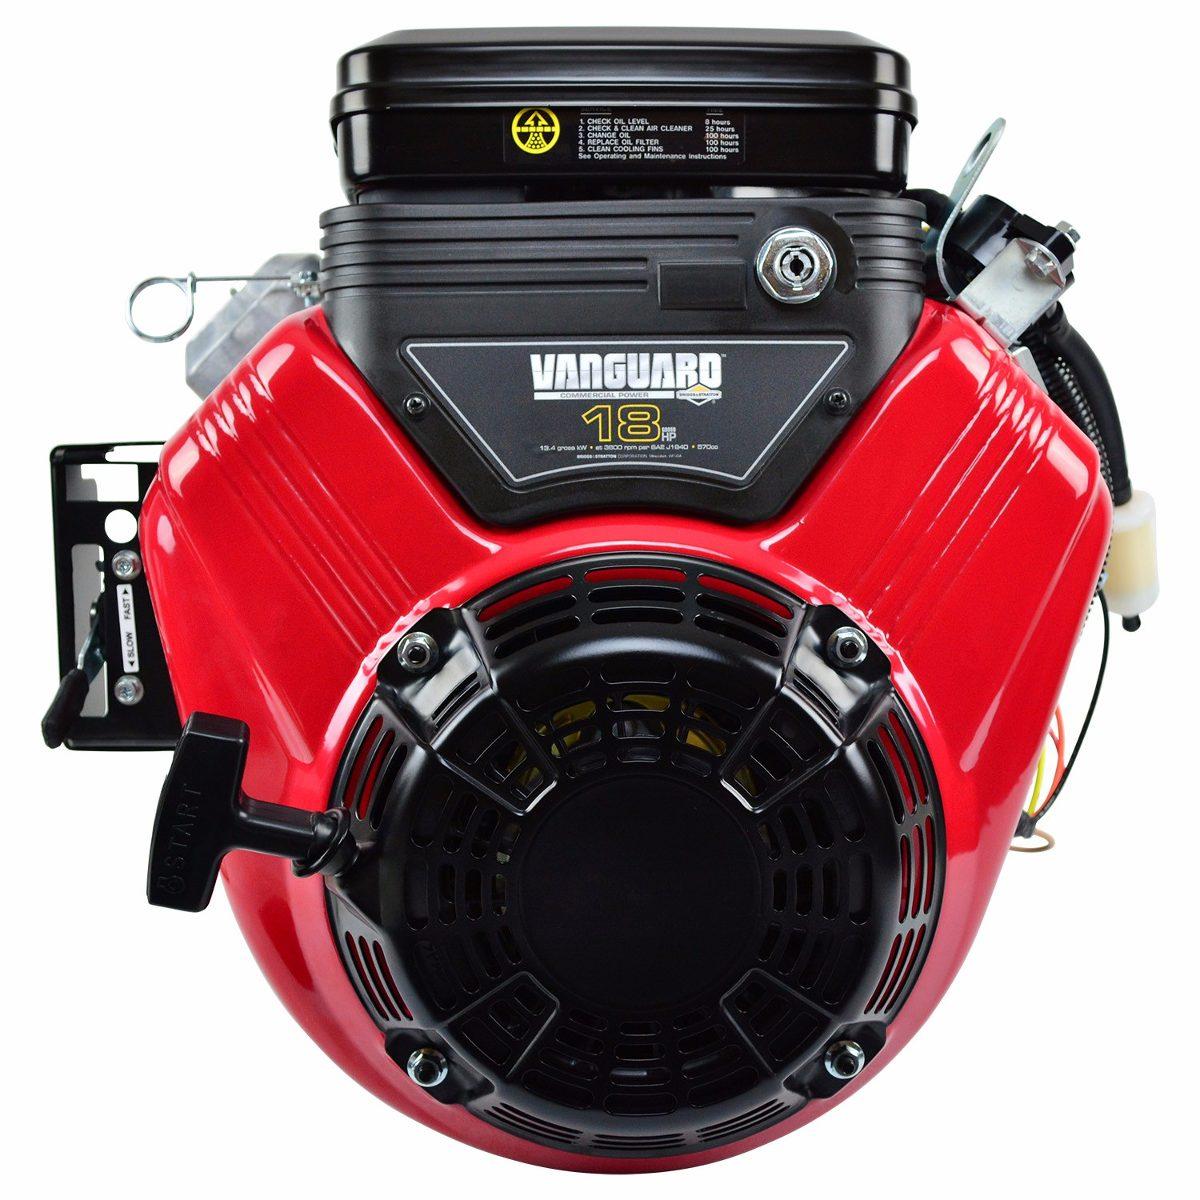 Motor Vanguard Briggs U0026stratton 356447 De 18 Hp Env U00edo